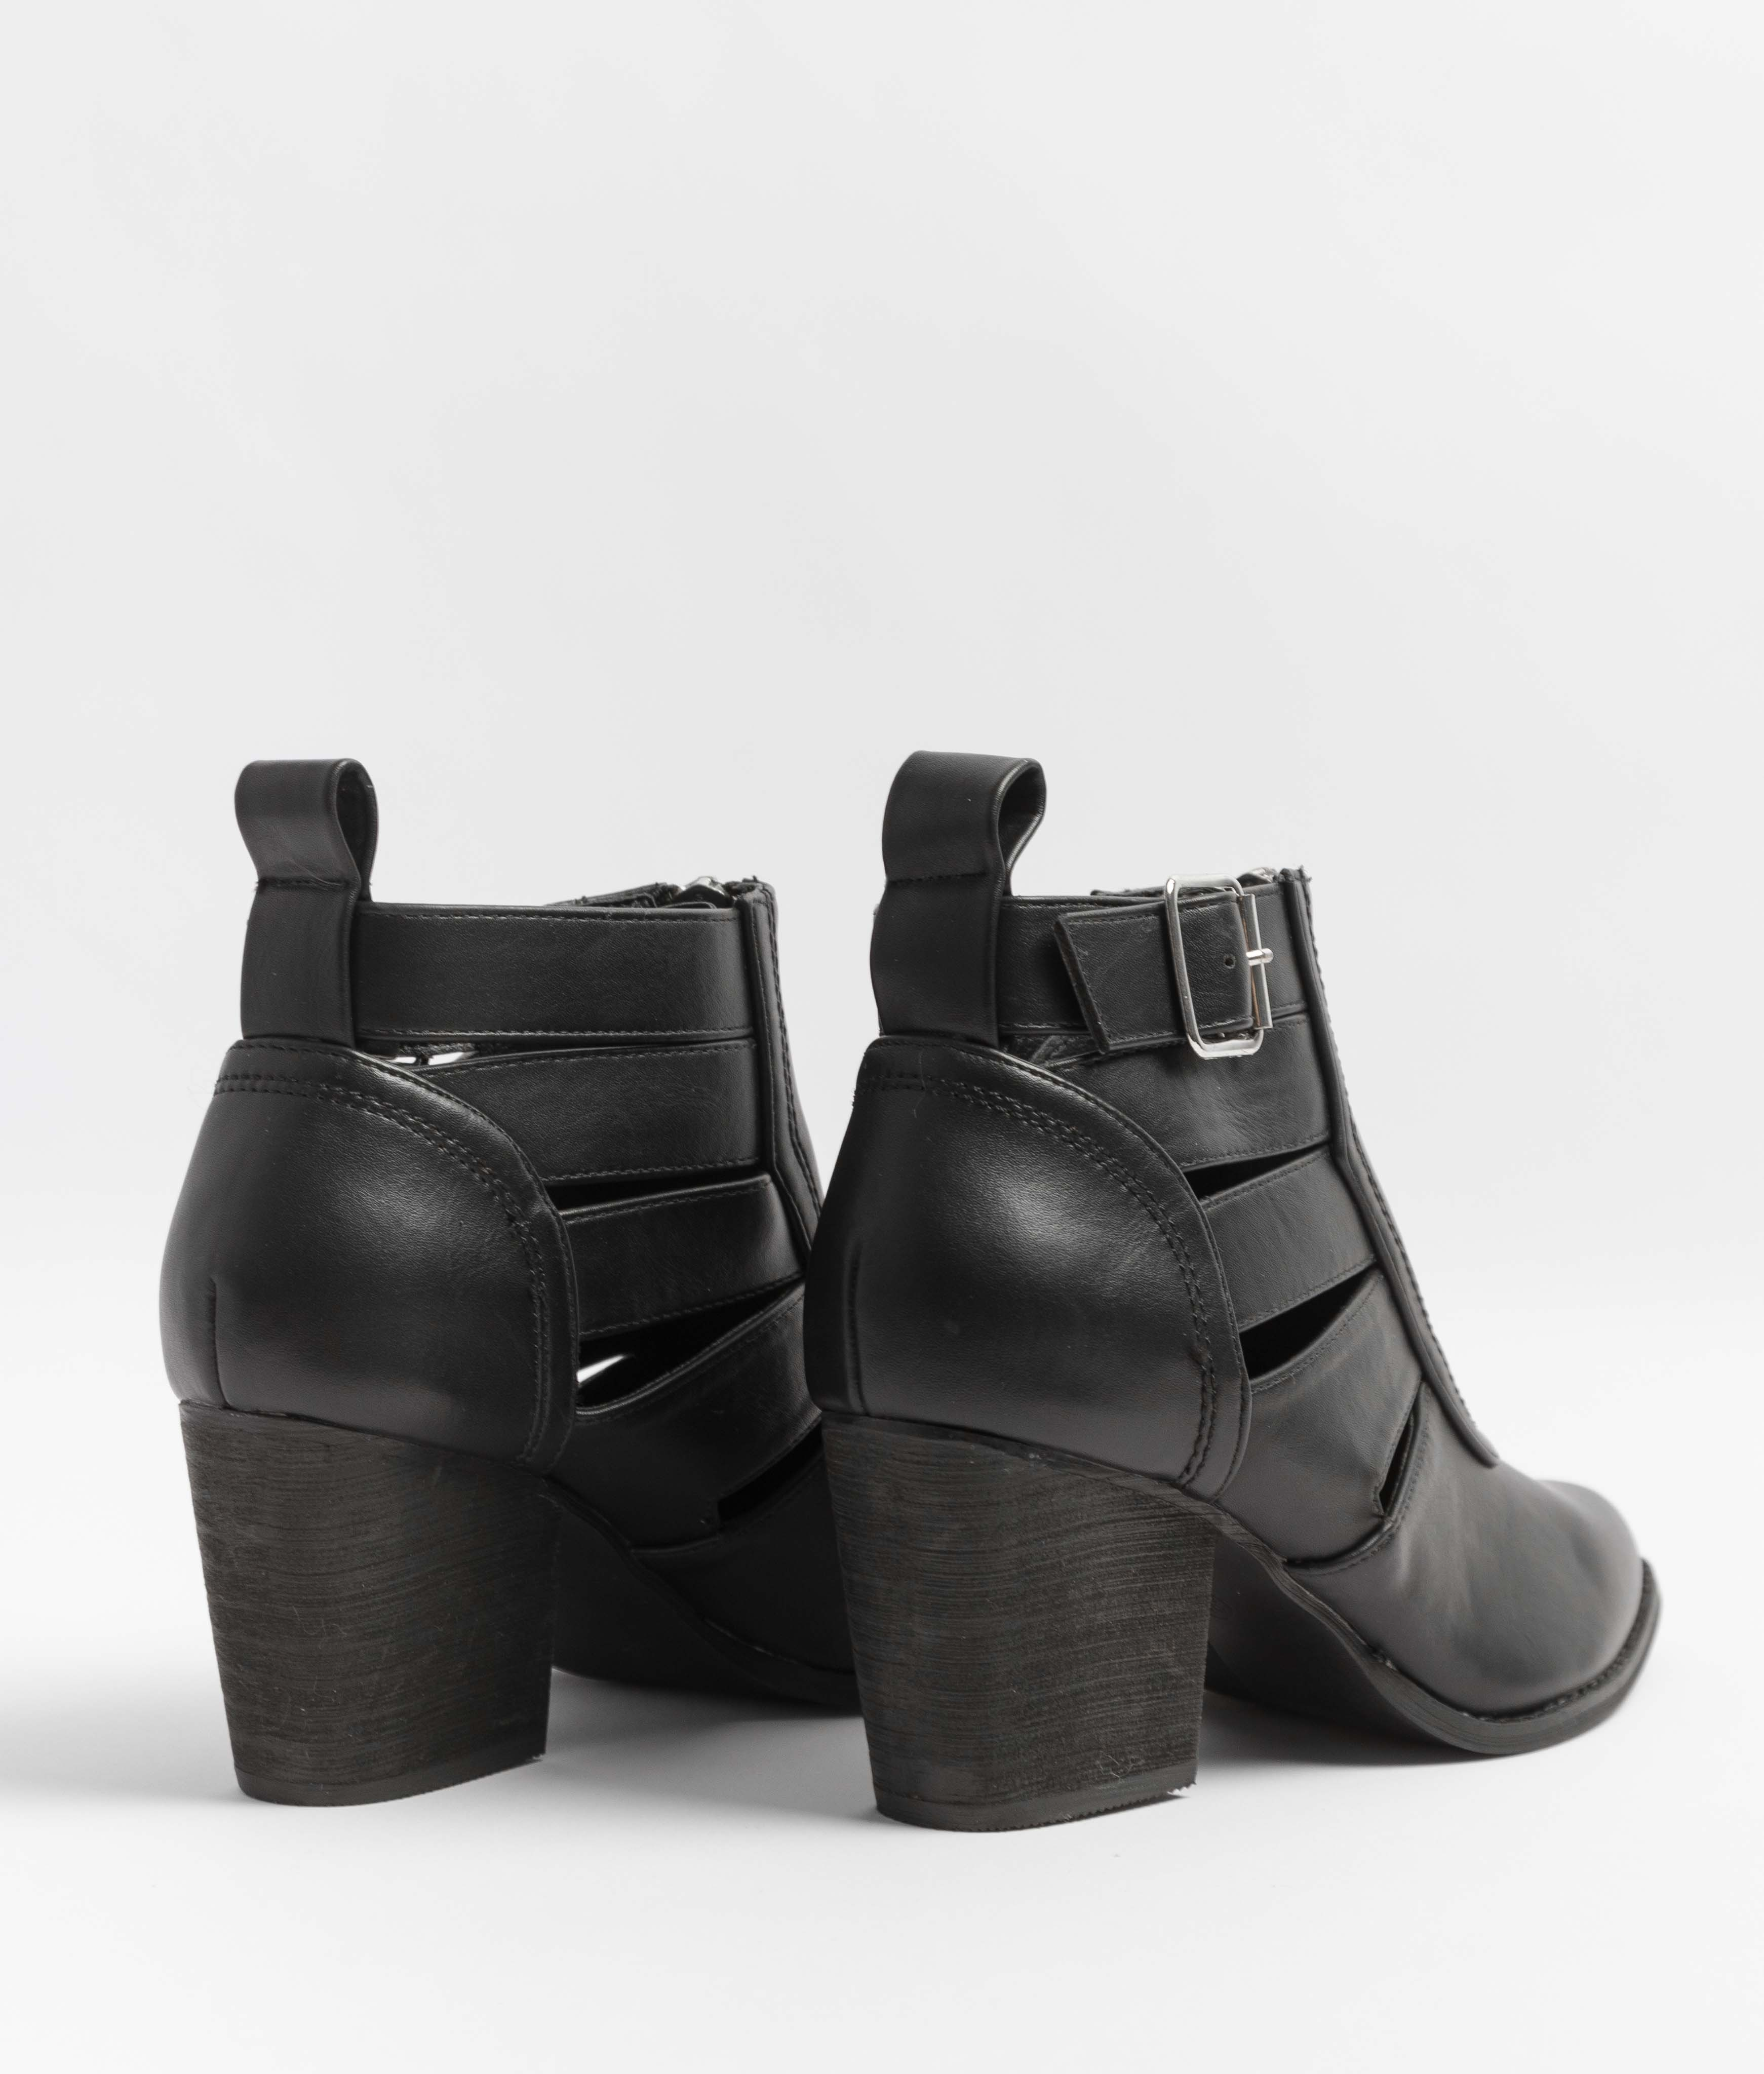 Boot Petite Pirla - Noir